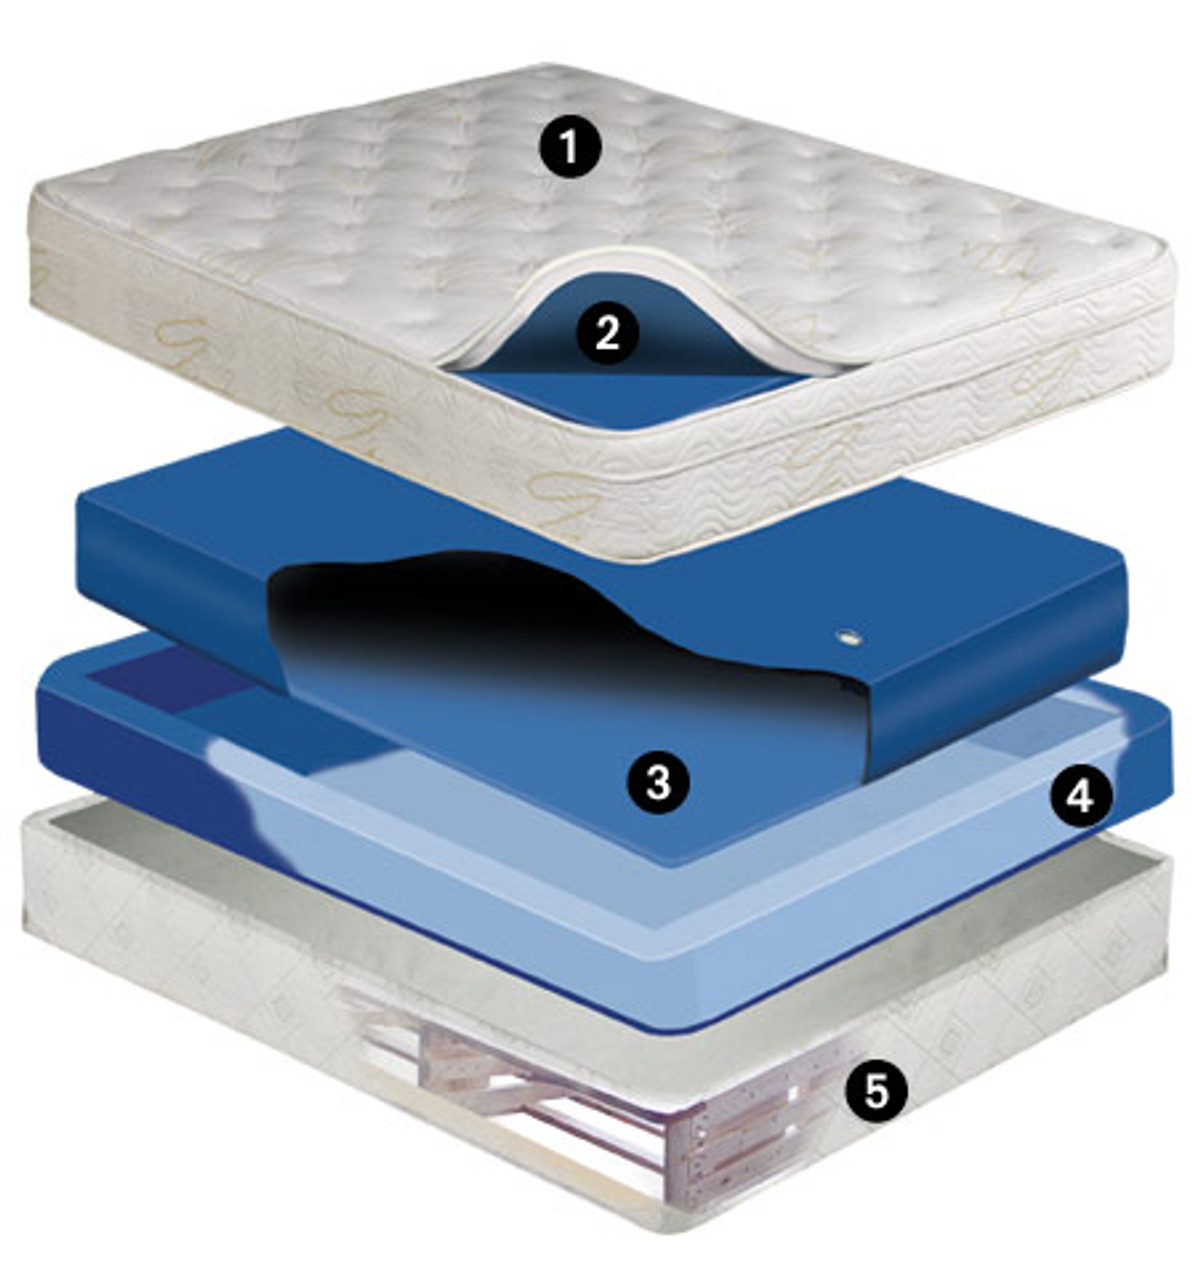 Equinox Deep Fill 9 inch Softside Waterbed Mattress Free Flow